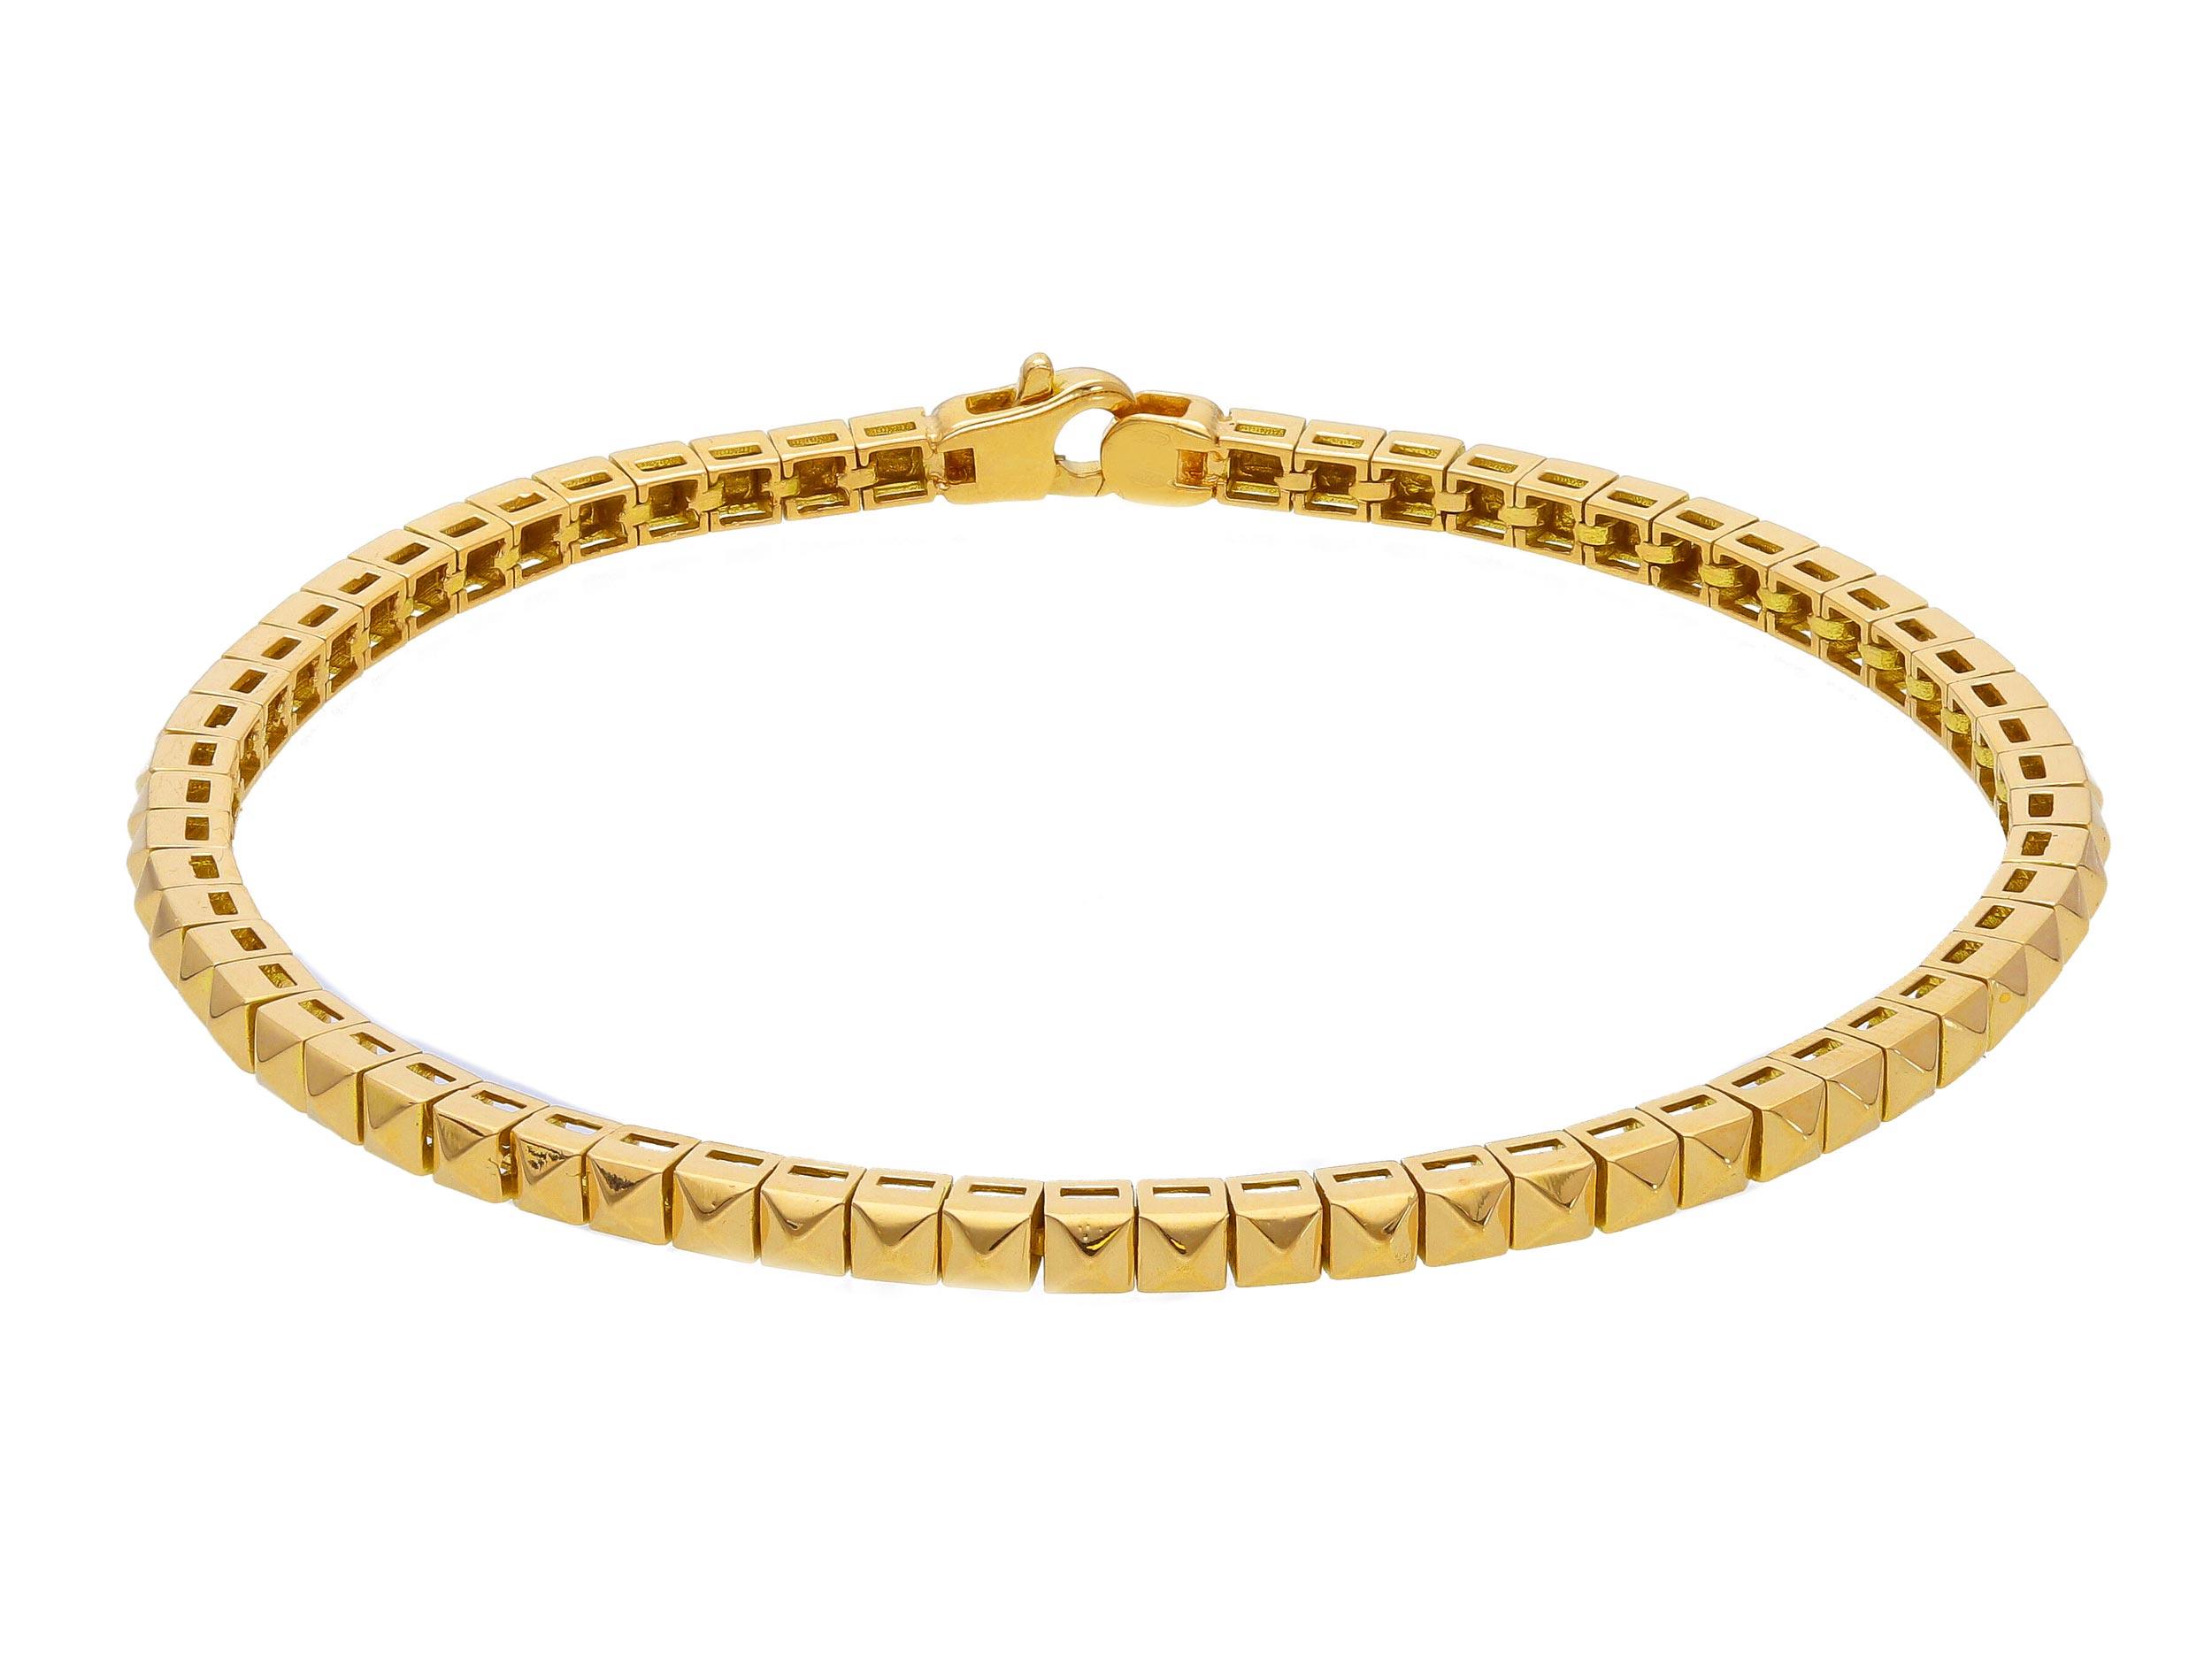 Stylish 18ct Yellow Gold Bracelet 21cm